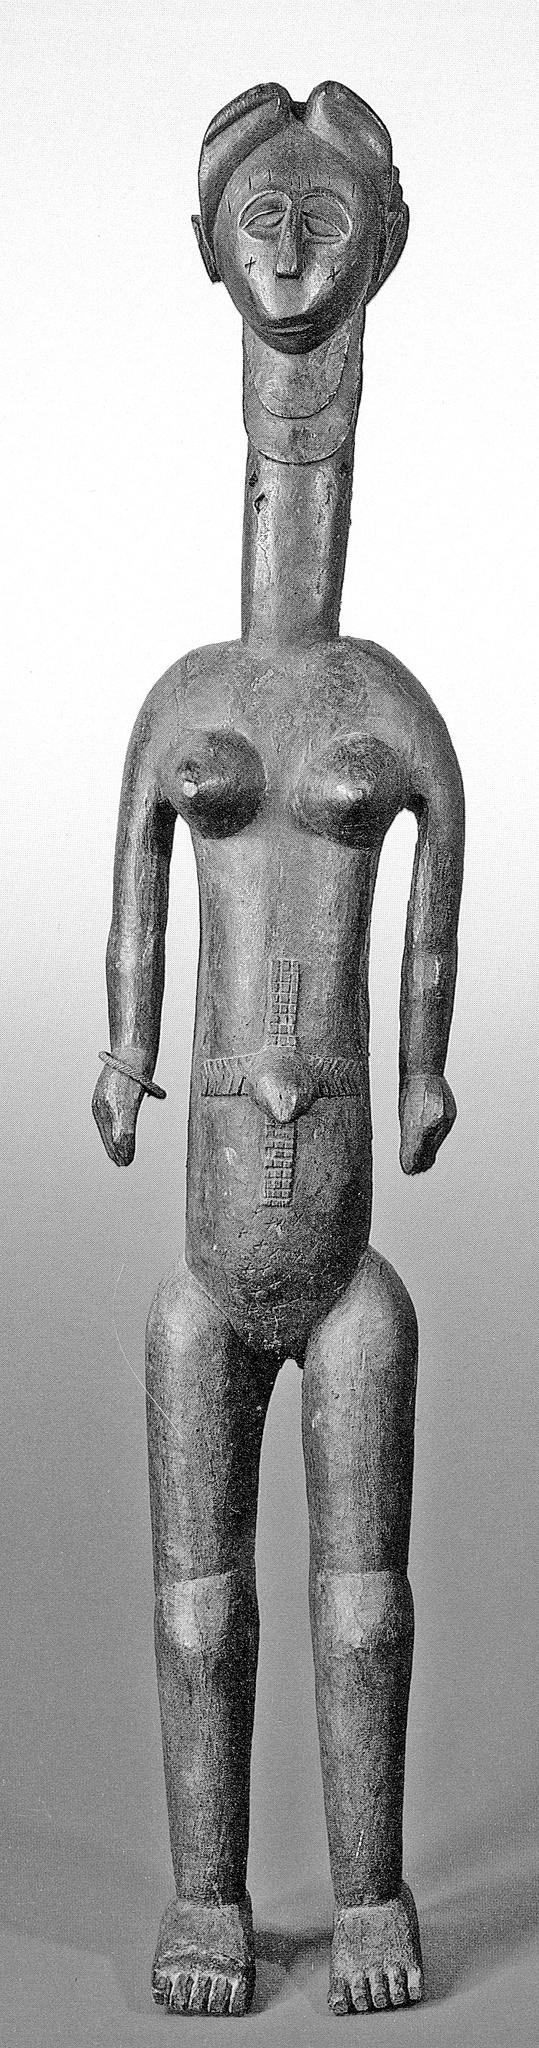 Rare female figure